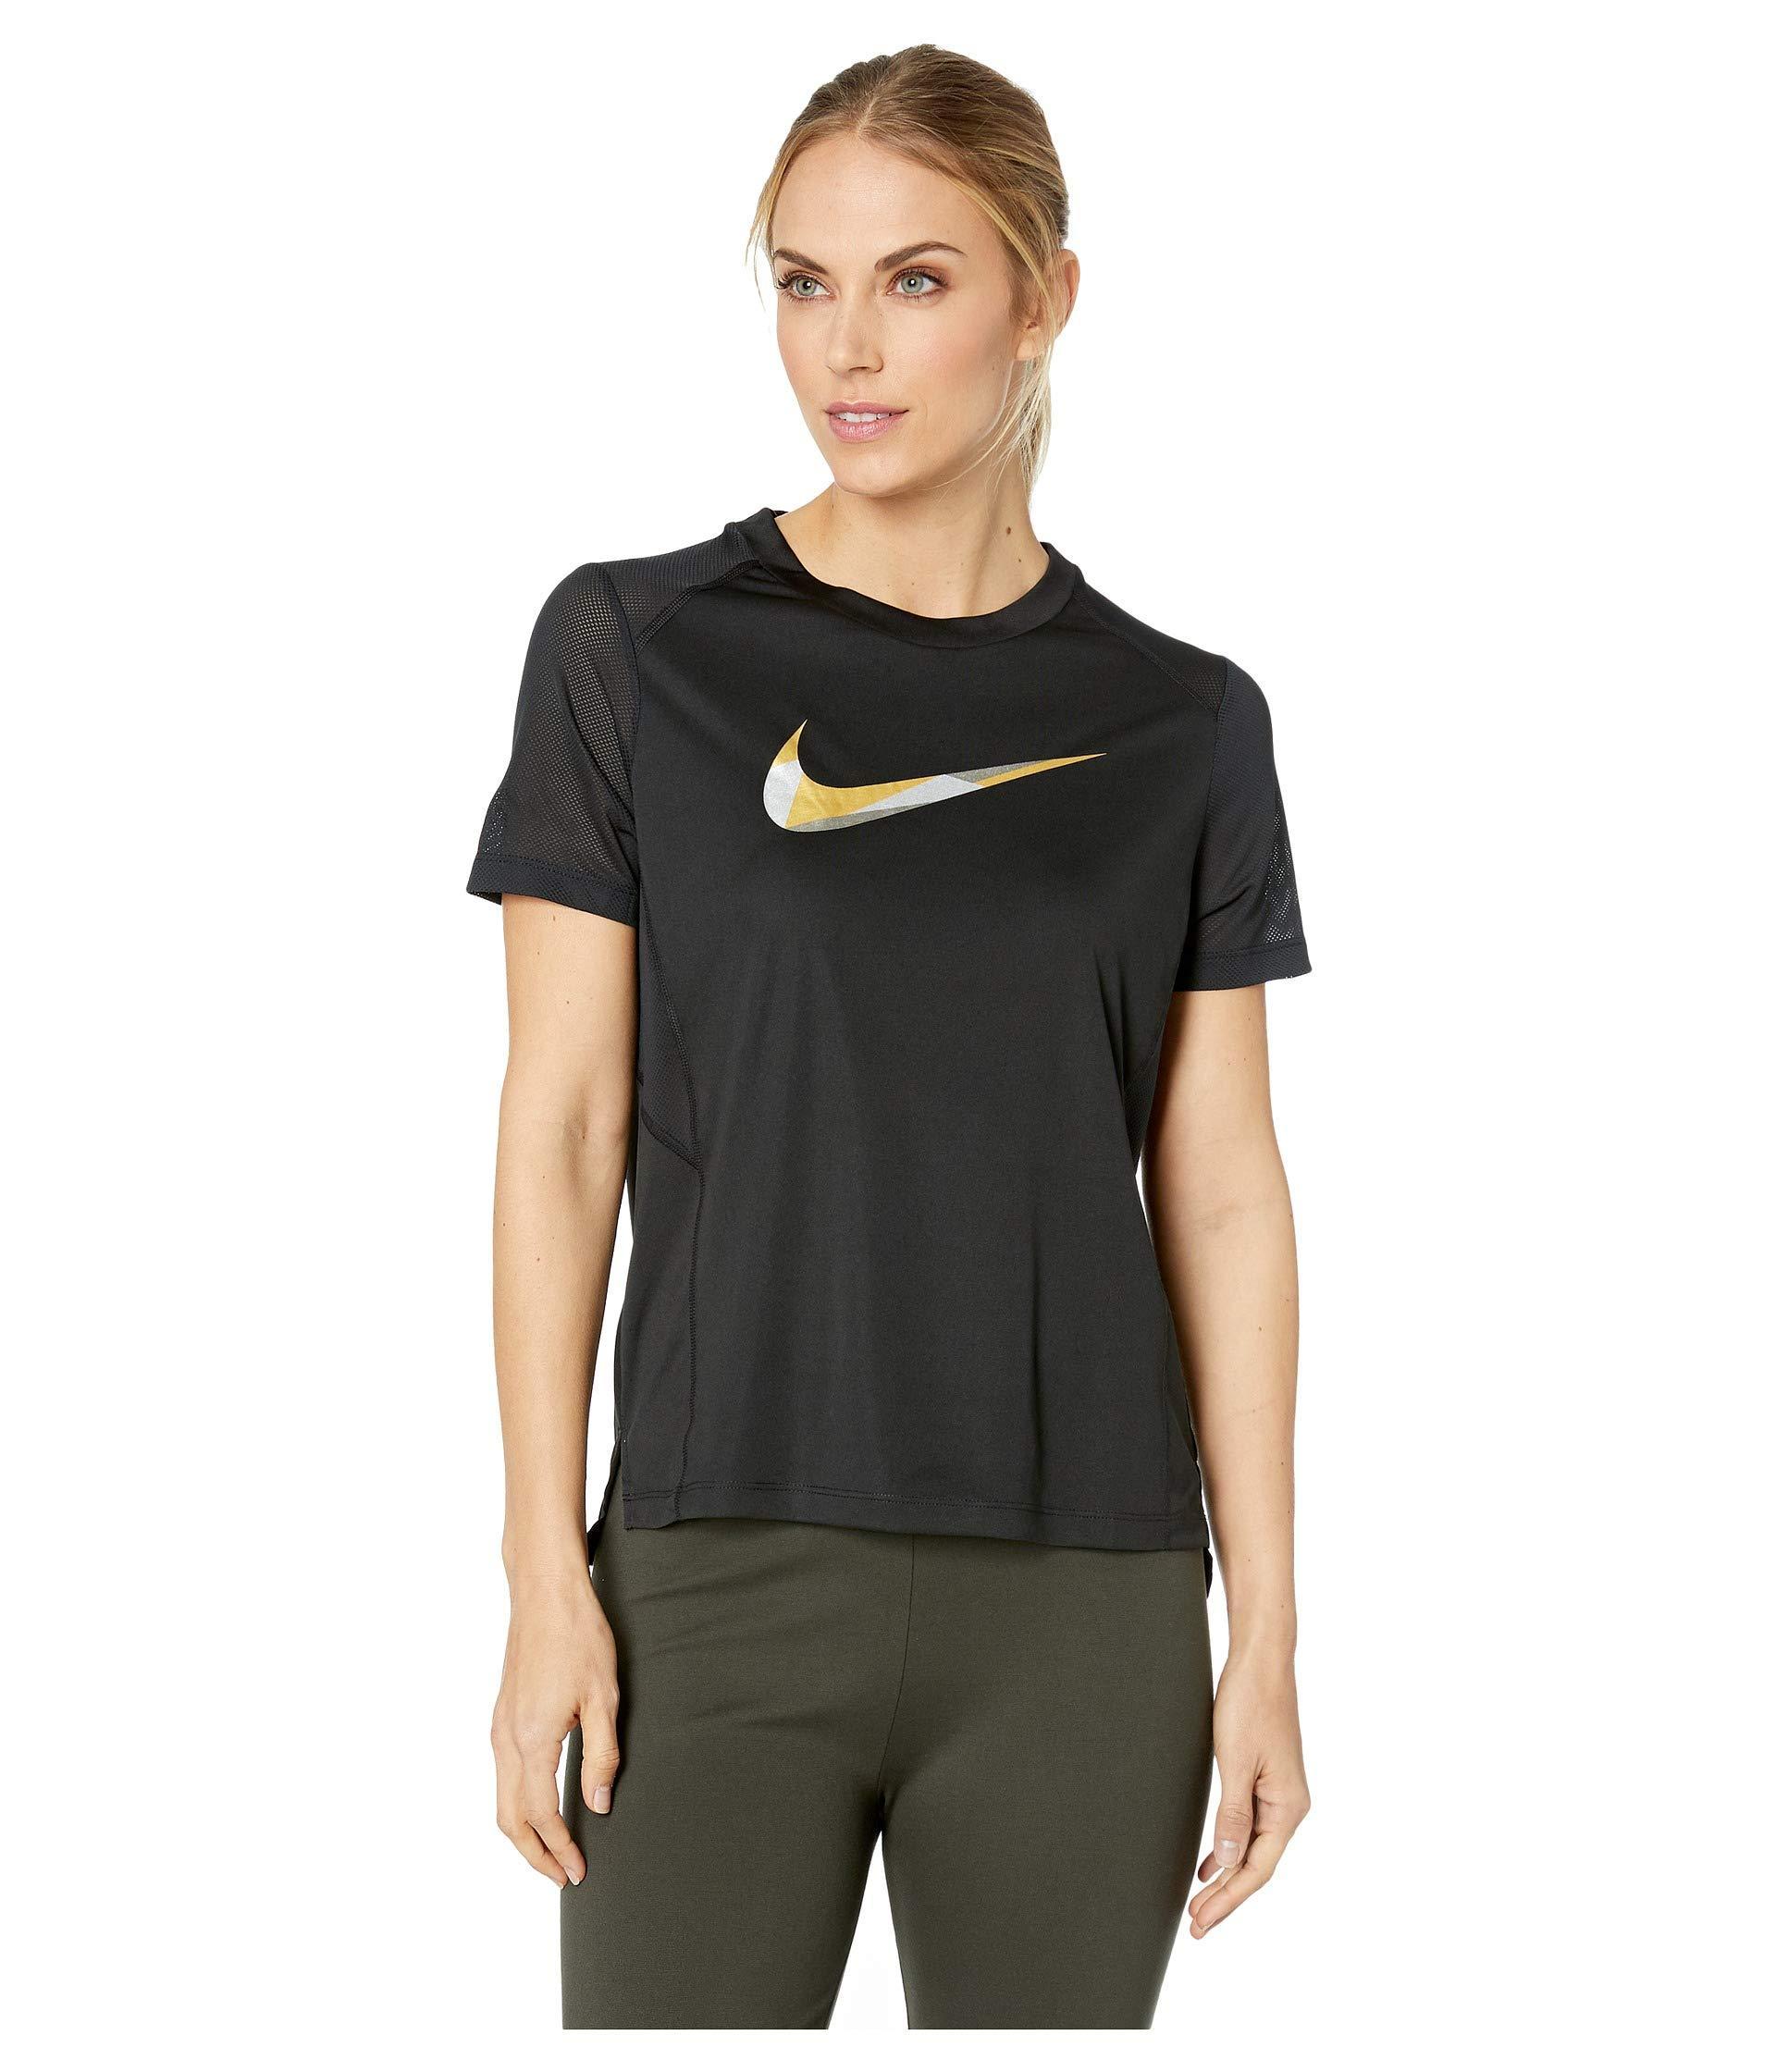 reputable site ba927 27da3 Lyst - Nike Miler Metallic Short Sleeve Top in Black - Save 4%